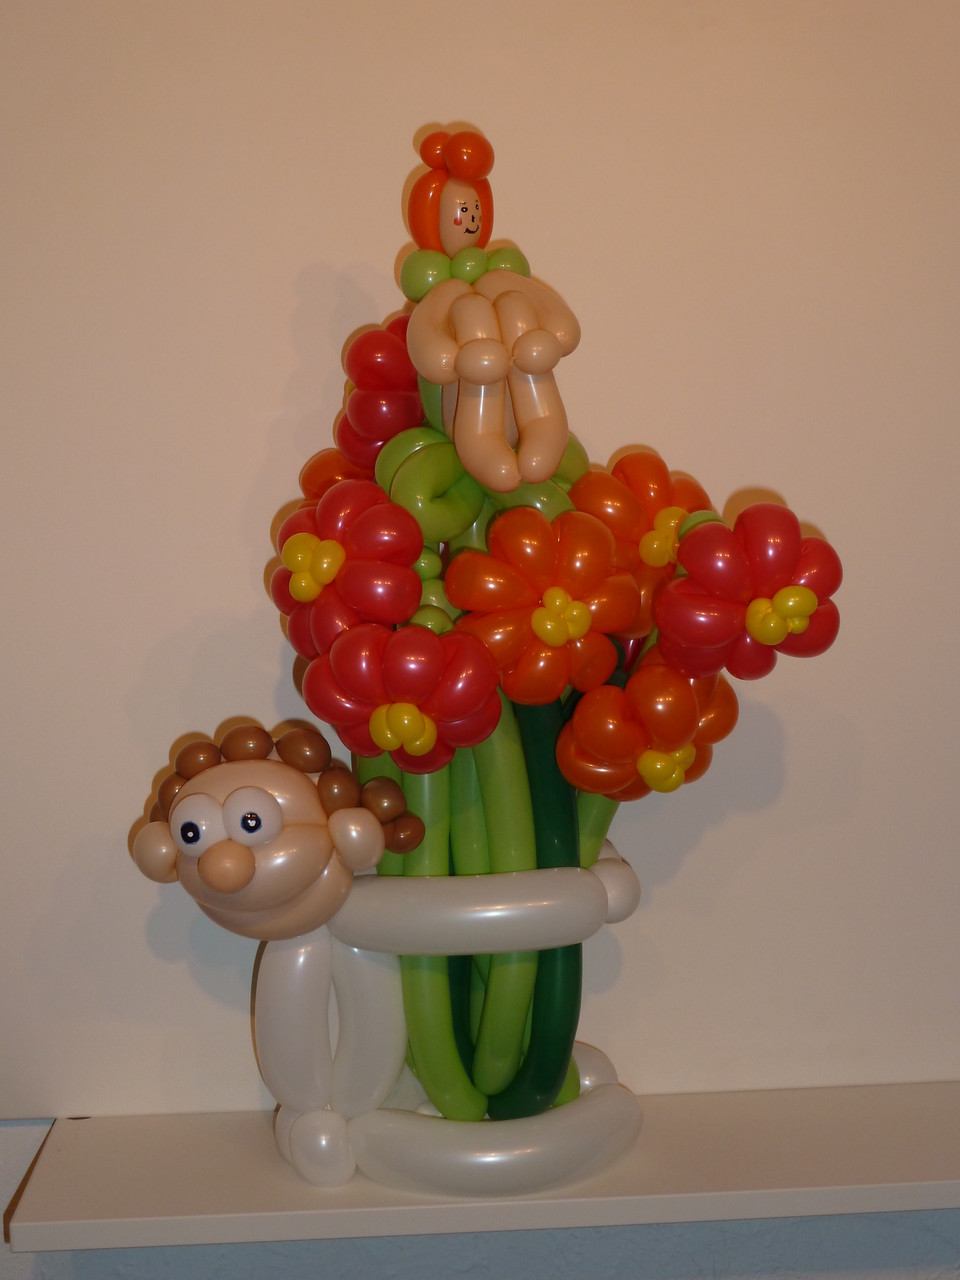 Ballonblumen twisten, Blumenstrauss, Ballonelfe, Geburtstag, Mr. toni balloni ch